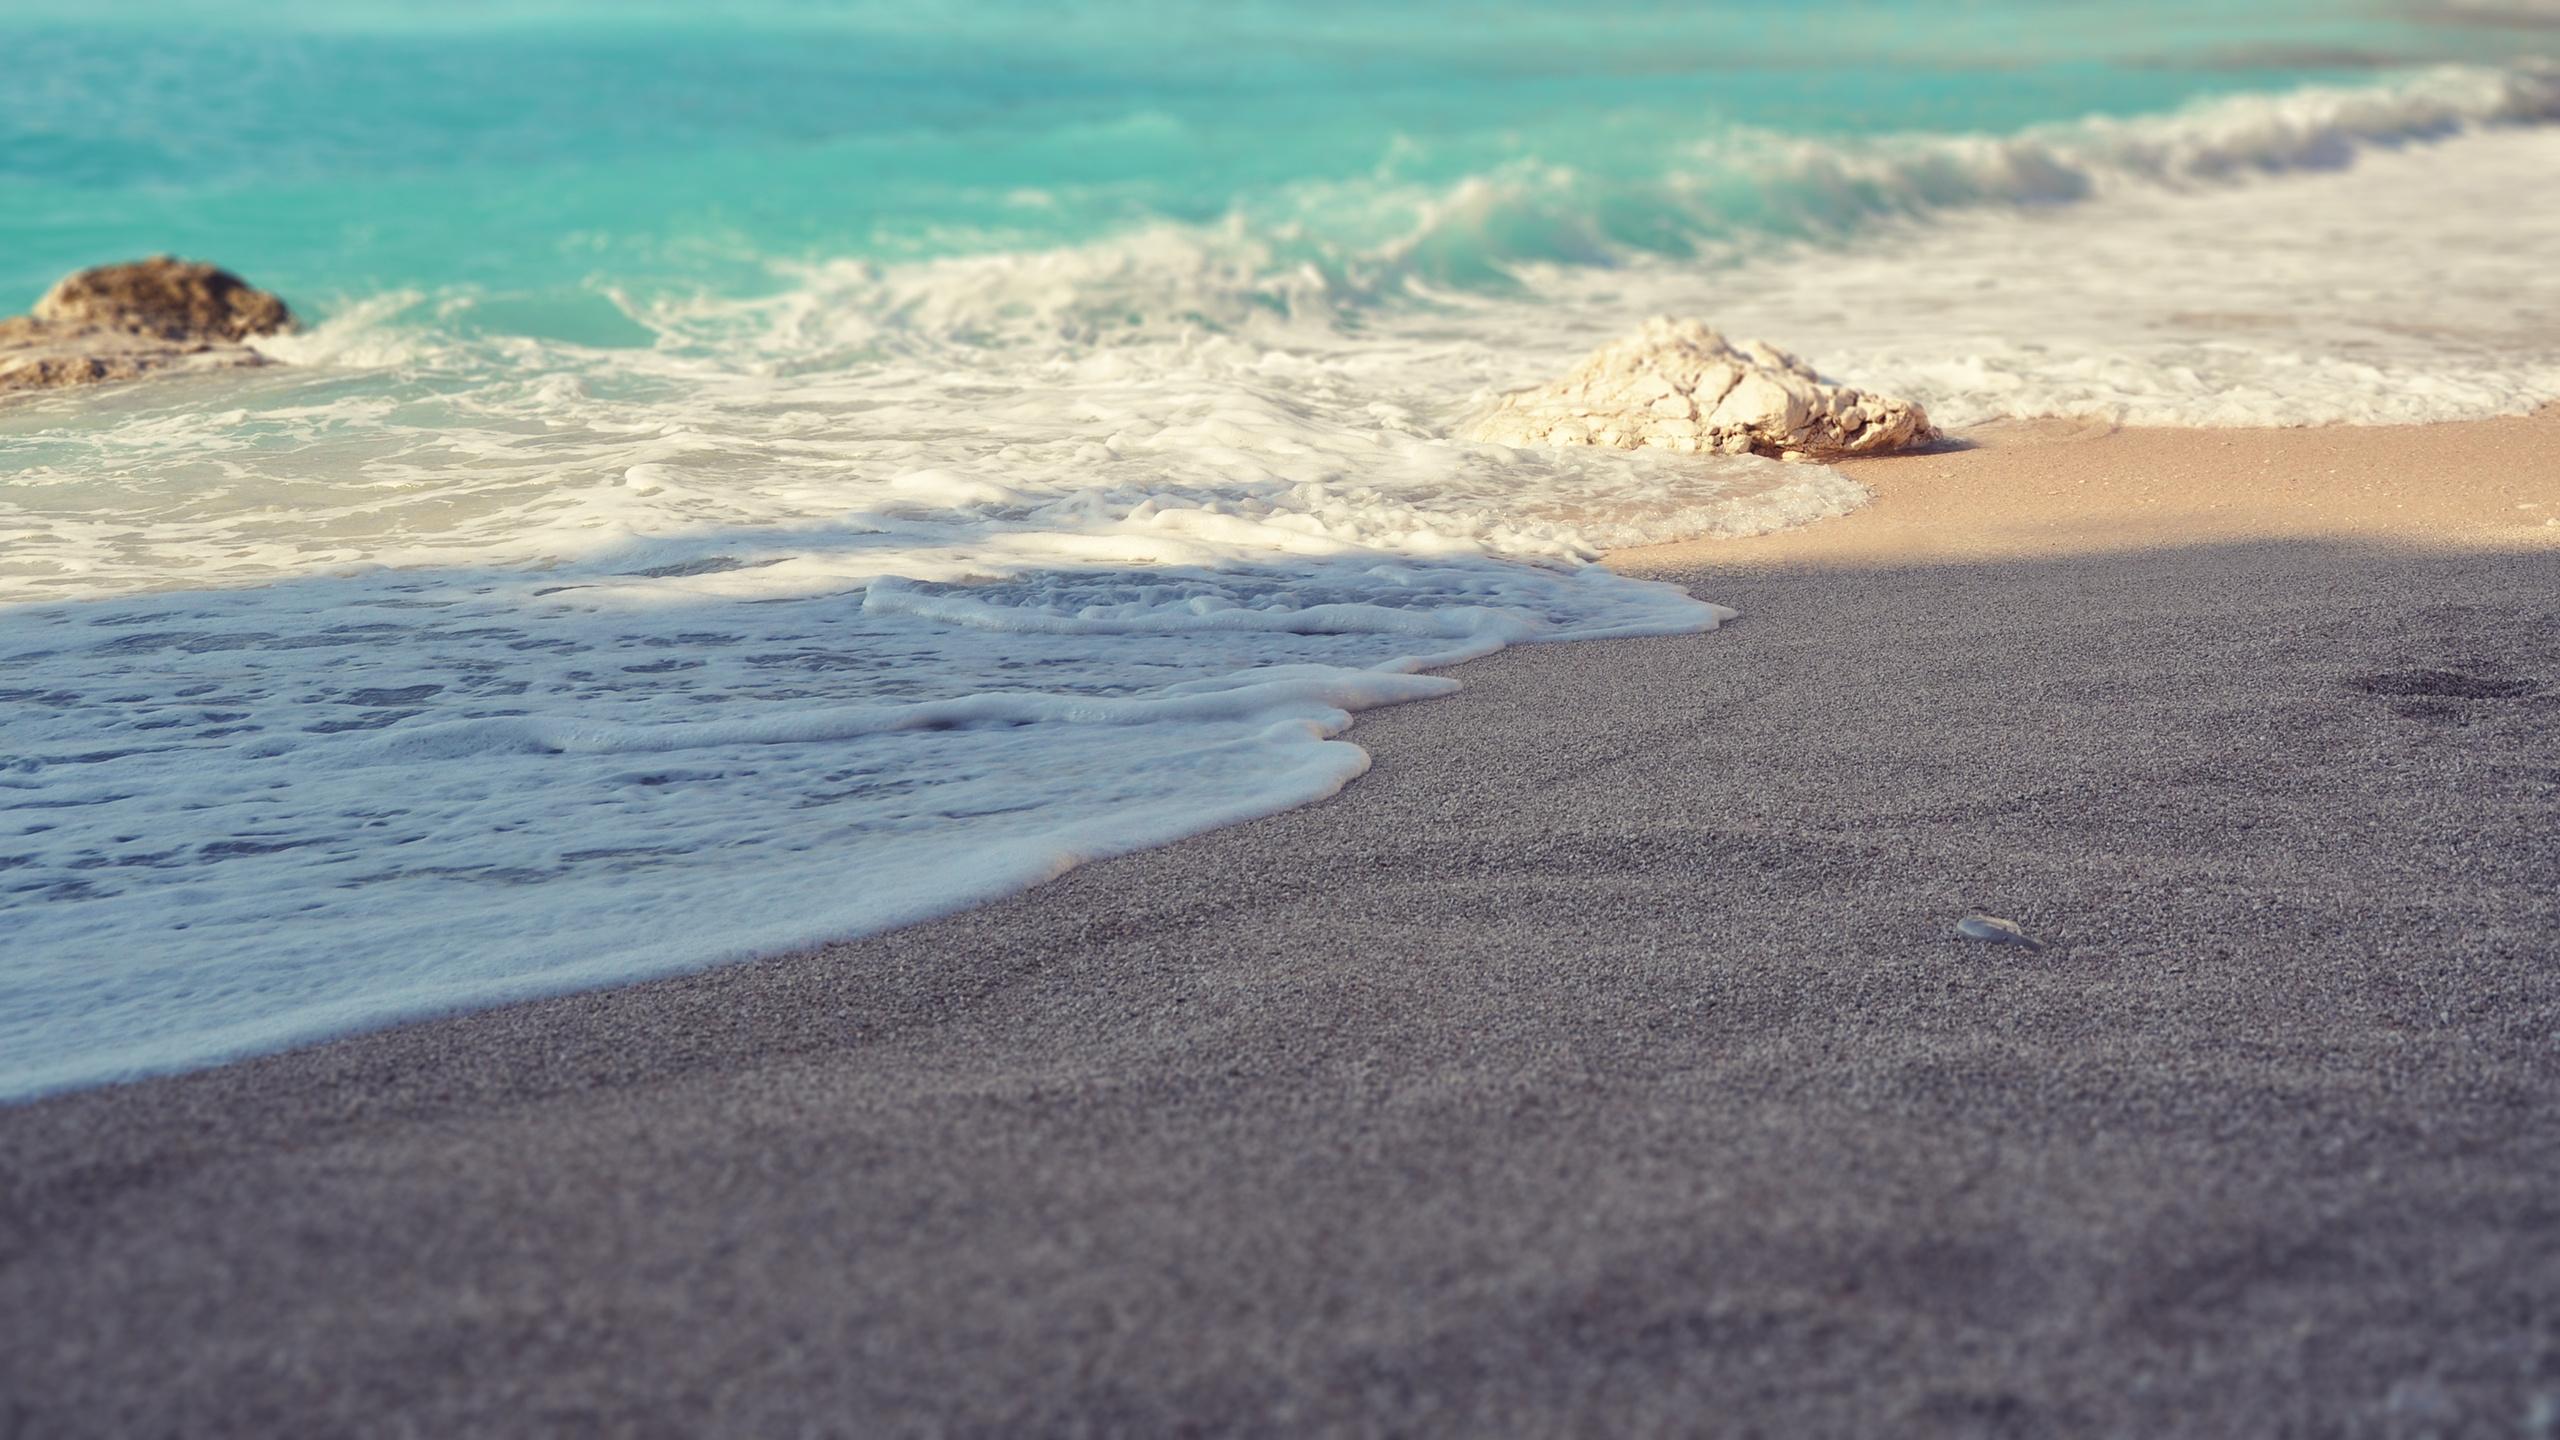 песок на берегу моря картинки узбек кизлари фотолари